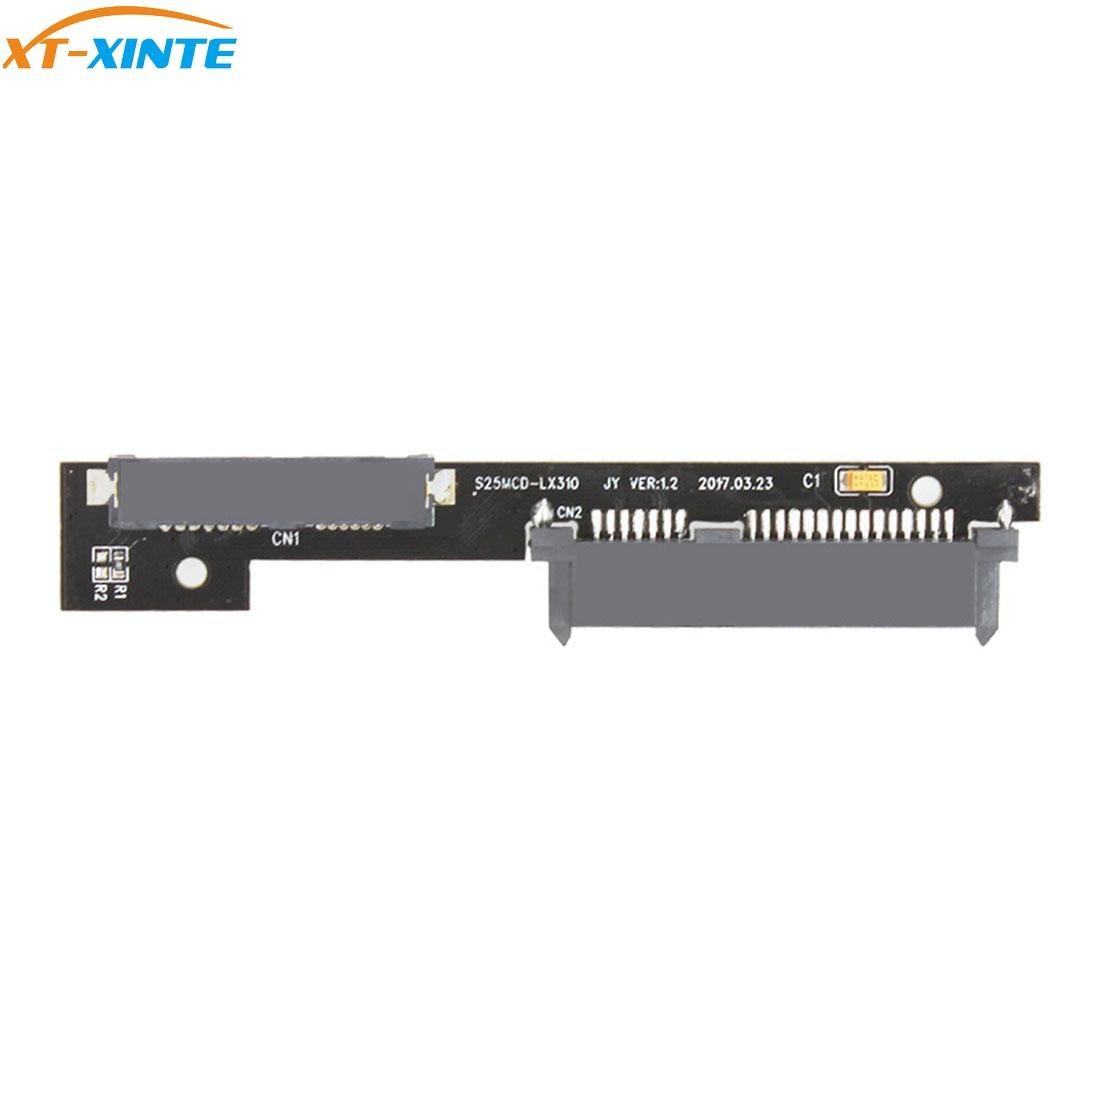 Pcb95 Pro SATA Caddy SATA3 Drive Bracket Pcb SATA TO Slim PCB For Optical Caddy For Lenovo 320 310 510 110 Series